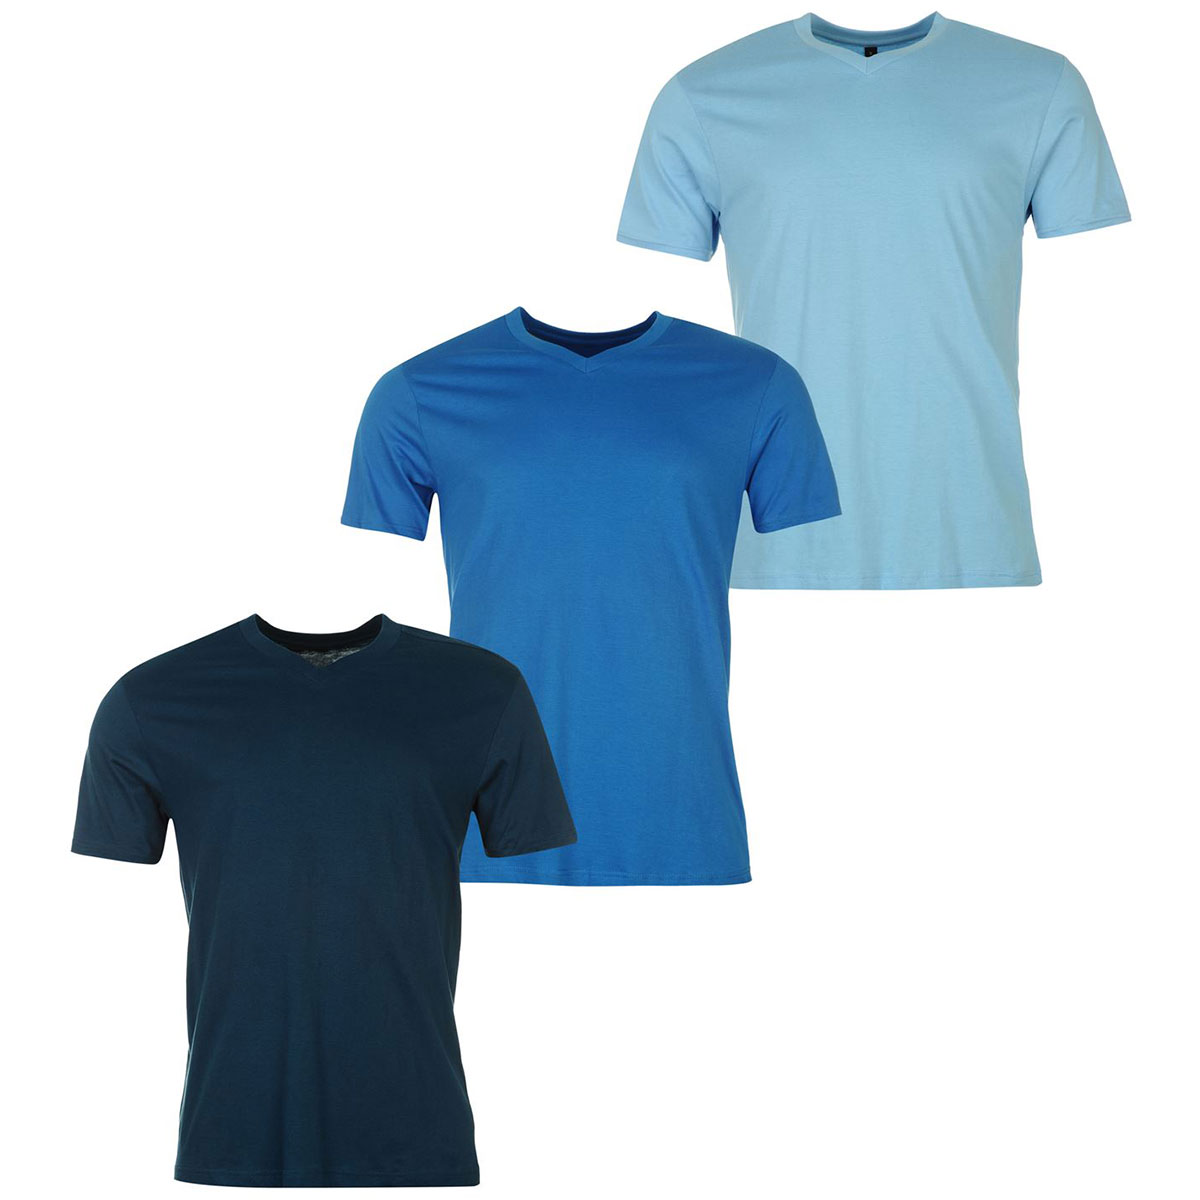 Donnay Men's V-Neck Short-Sleeve Tees, 3-Pack - Blue, 4XL